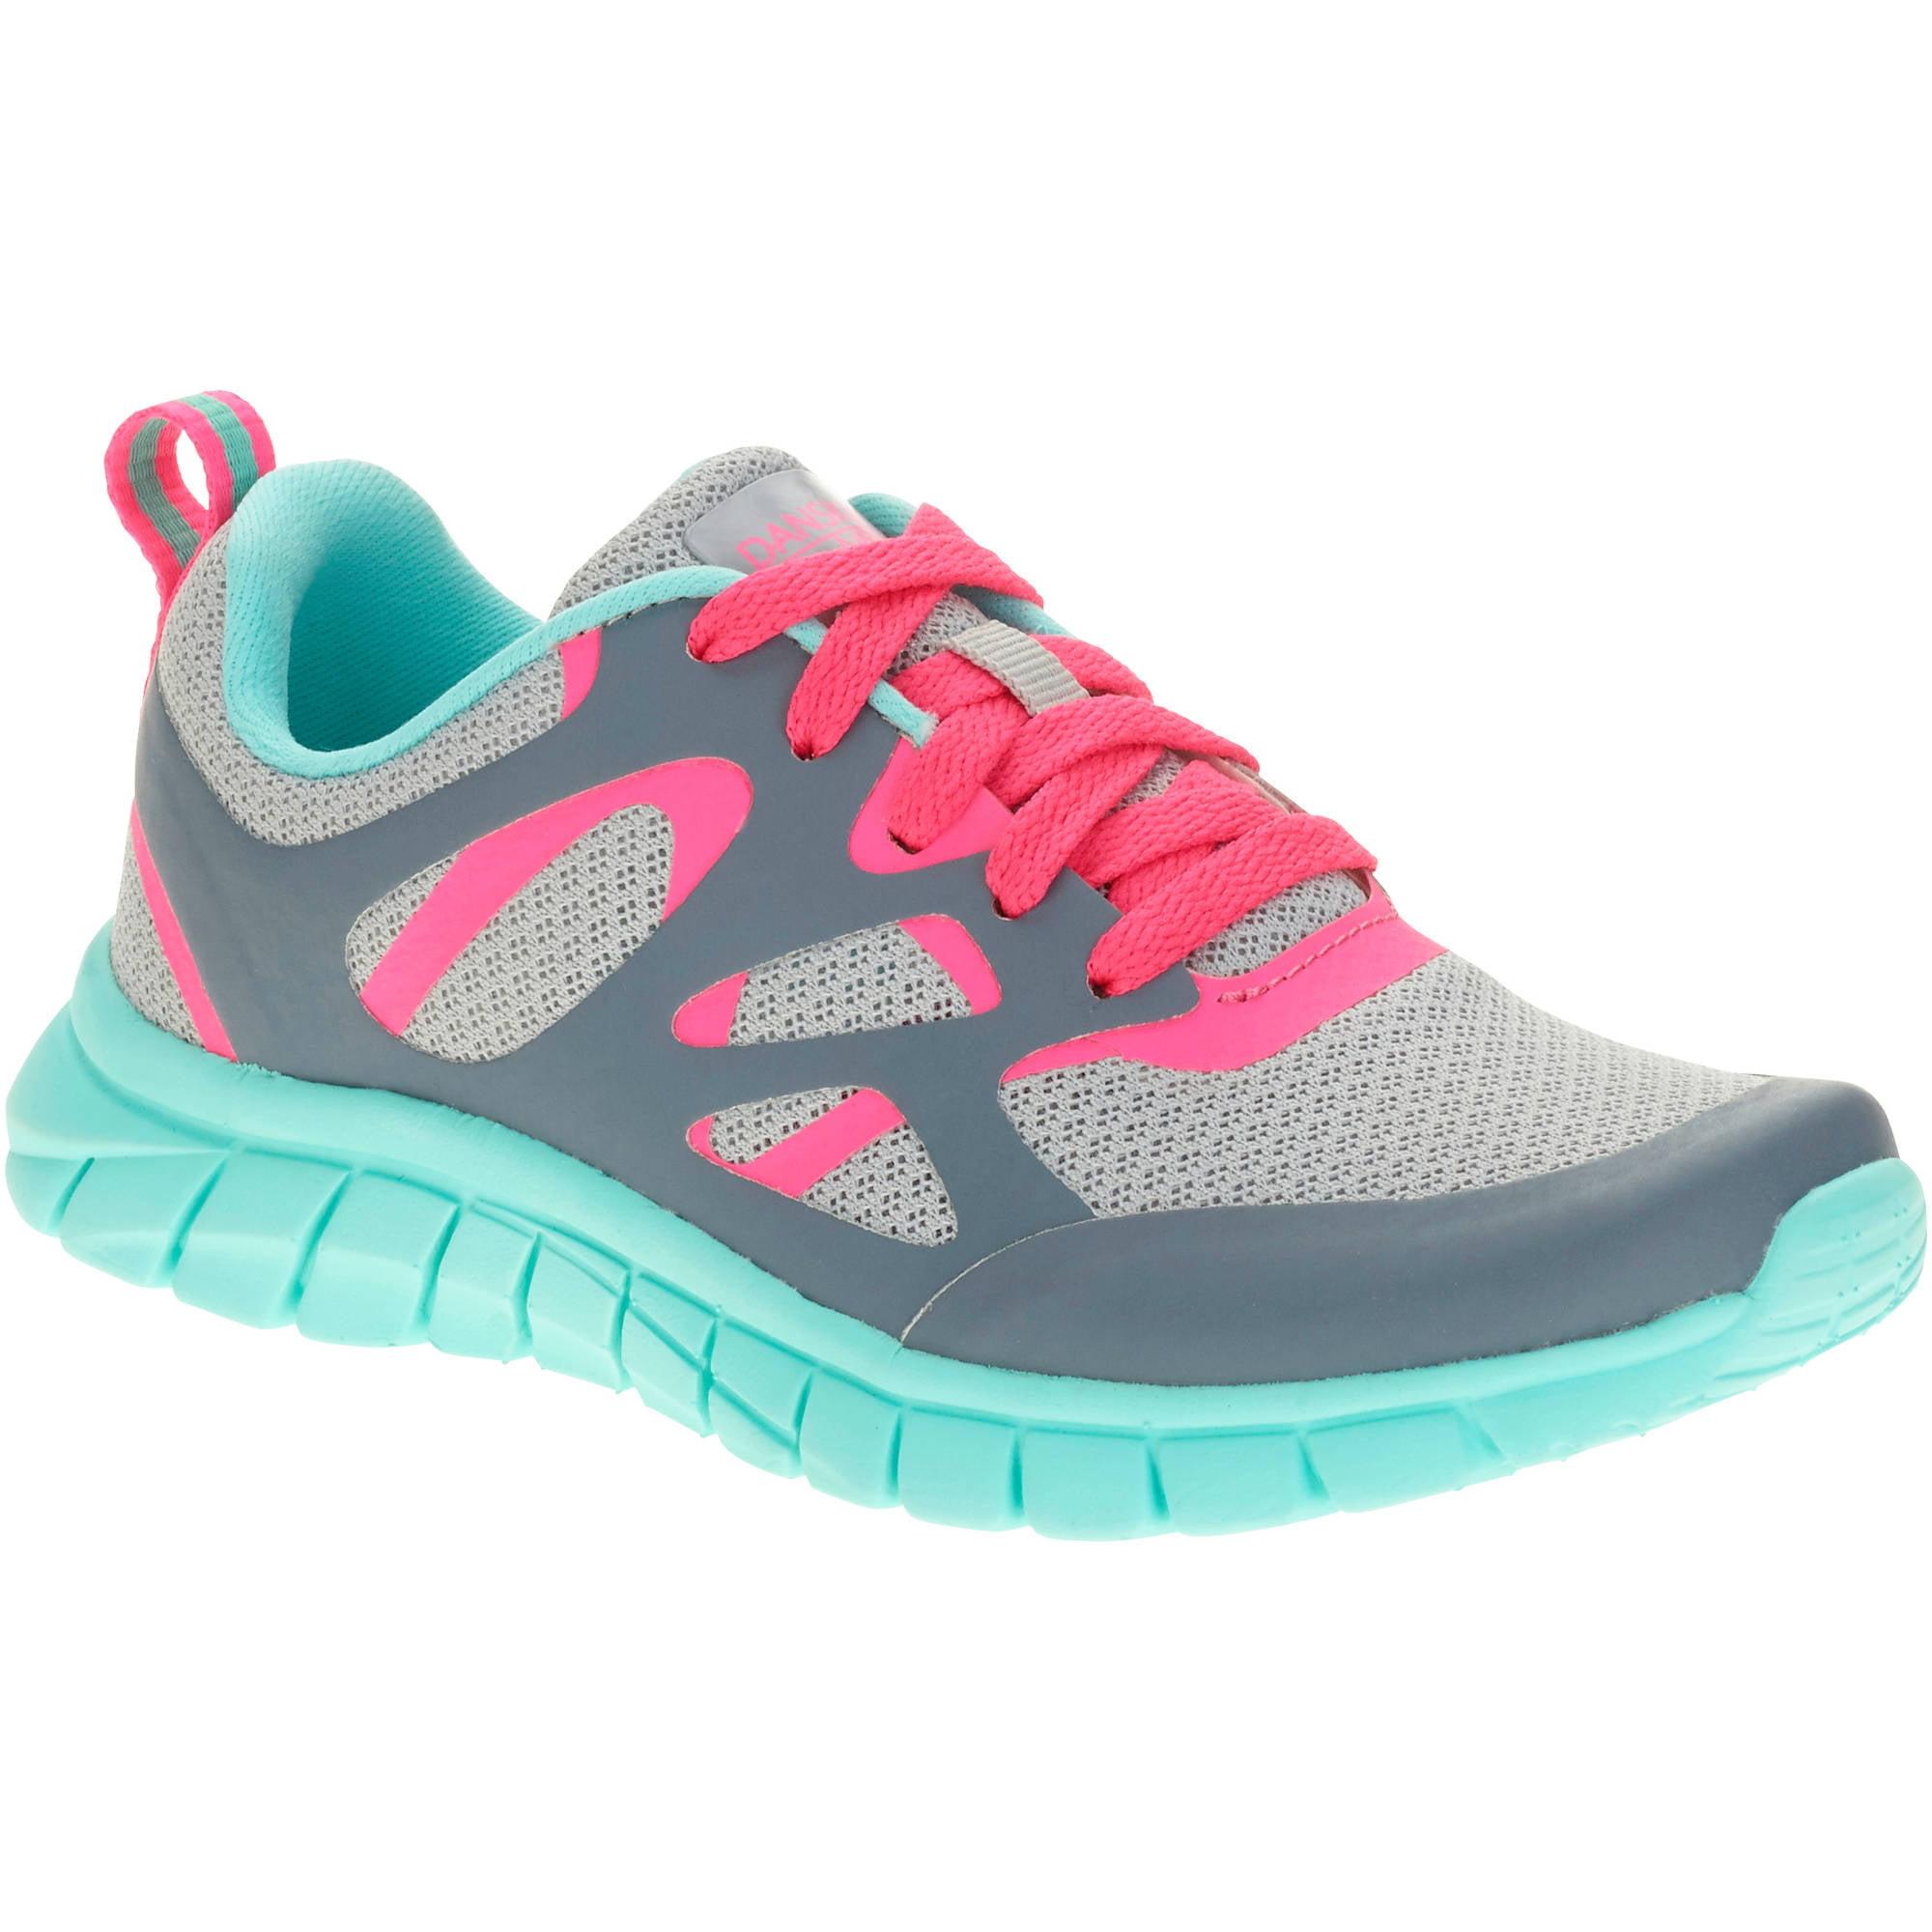 Danskin Now Girls' Athletic Overlay Shoe by